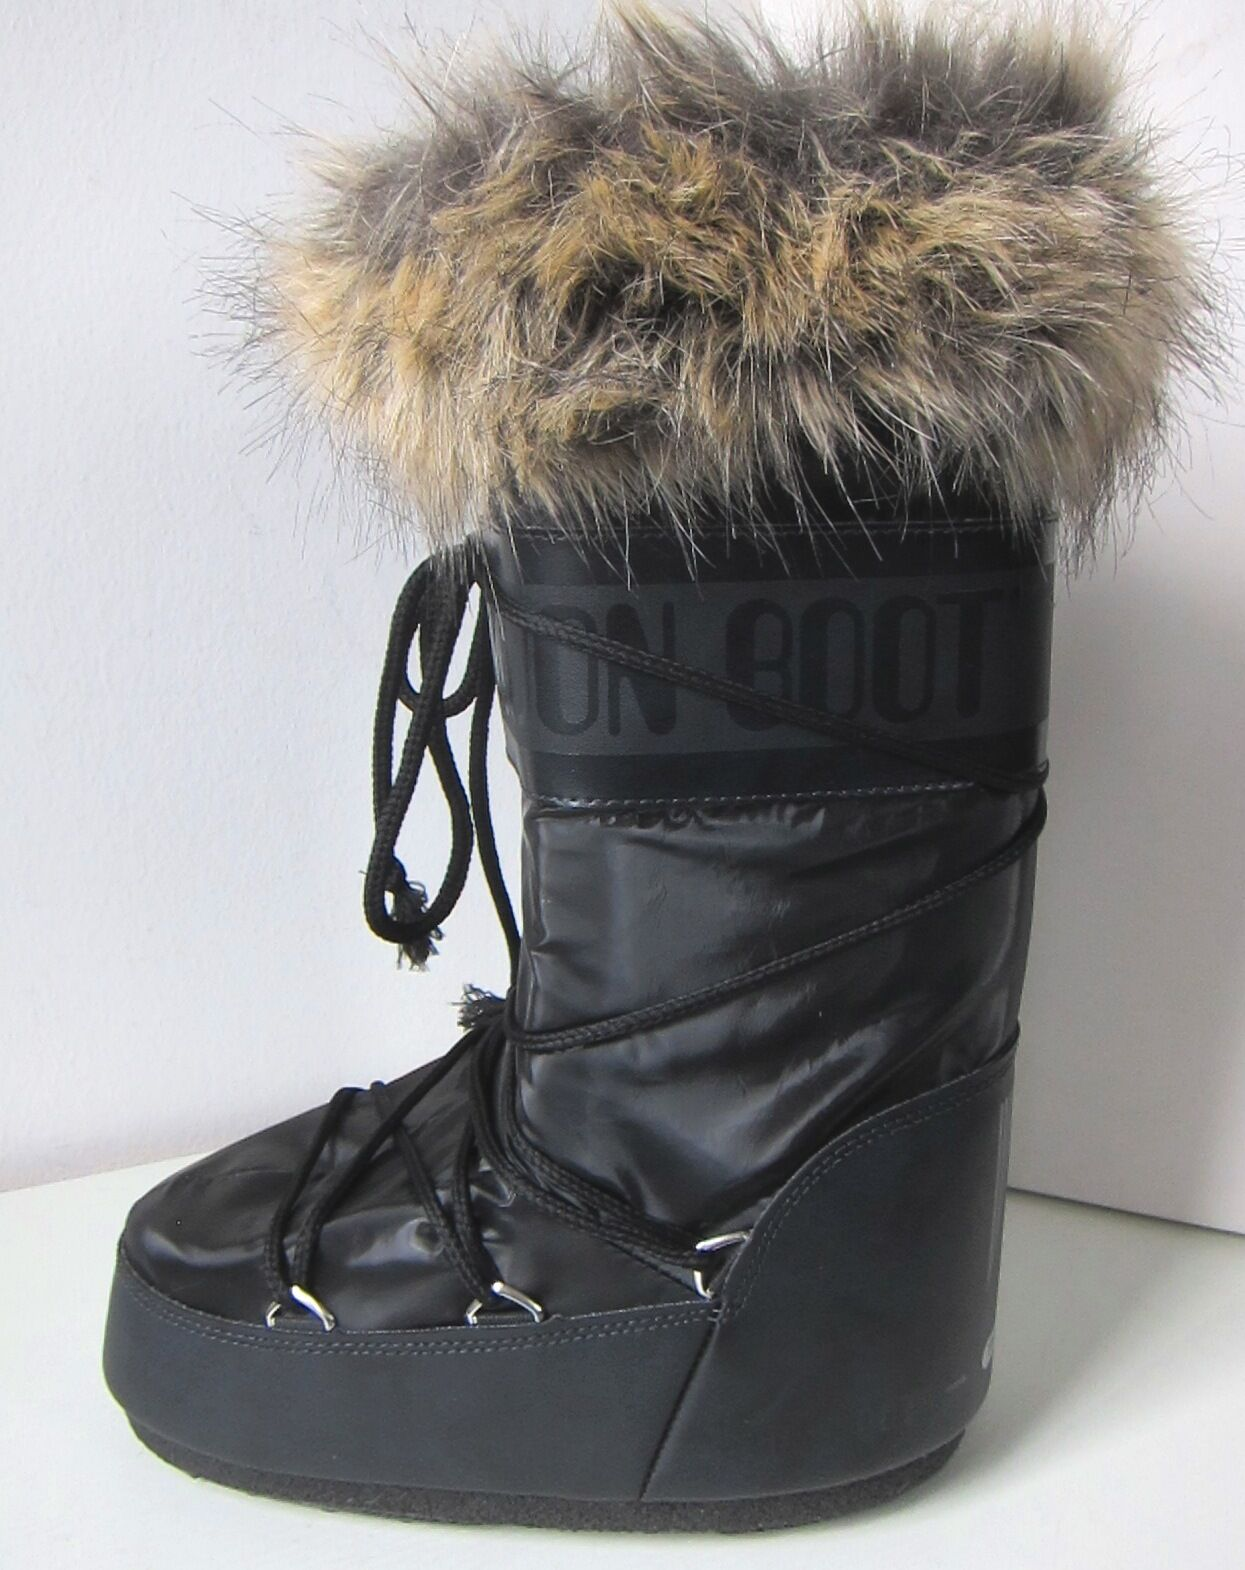 Tecnica Moon Boot romance negro Moon botas piel sintética fell Fake fur